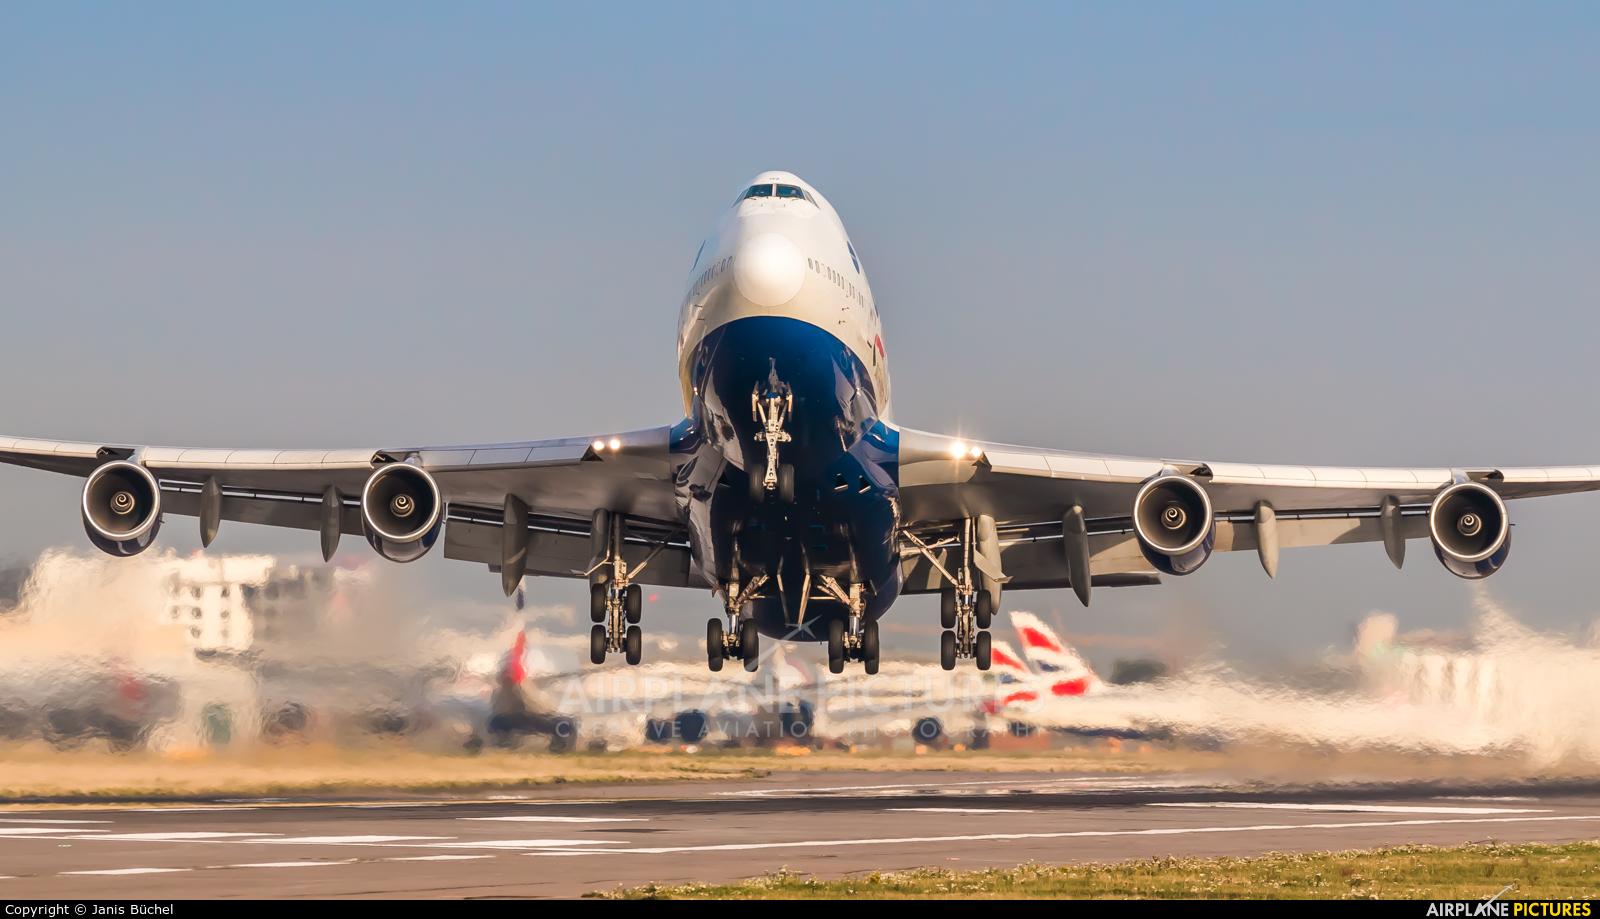 British Airways G-CIVZ aircraft at London - Heathrow